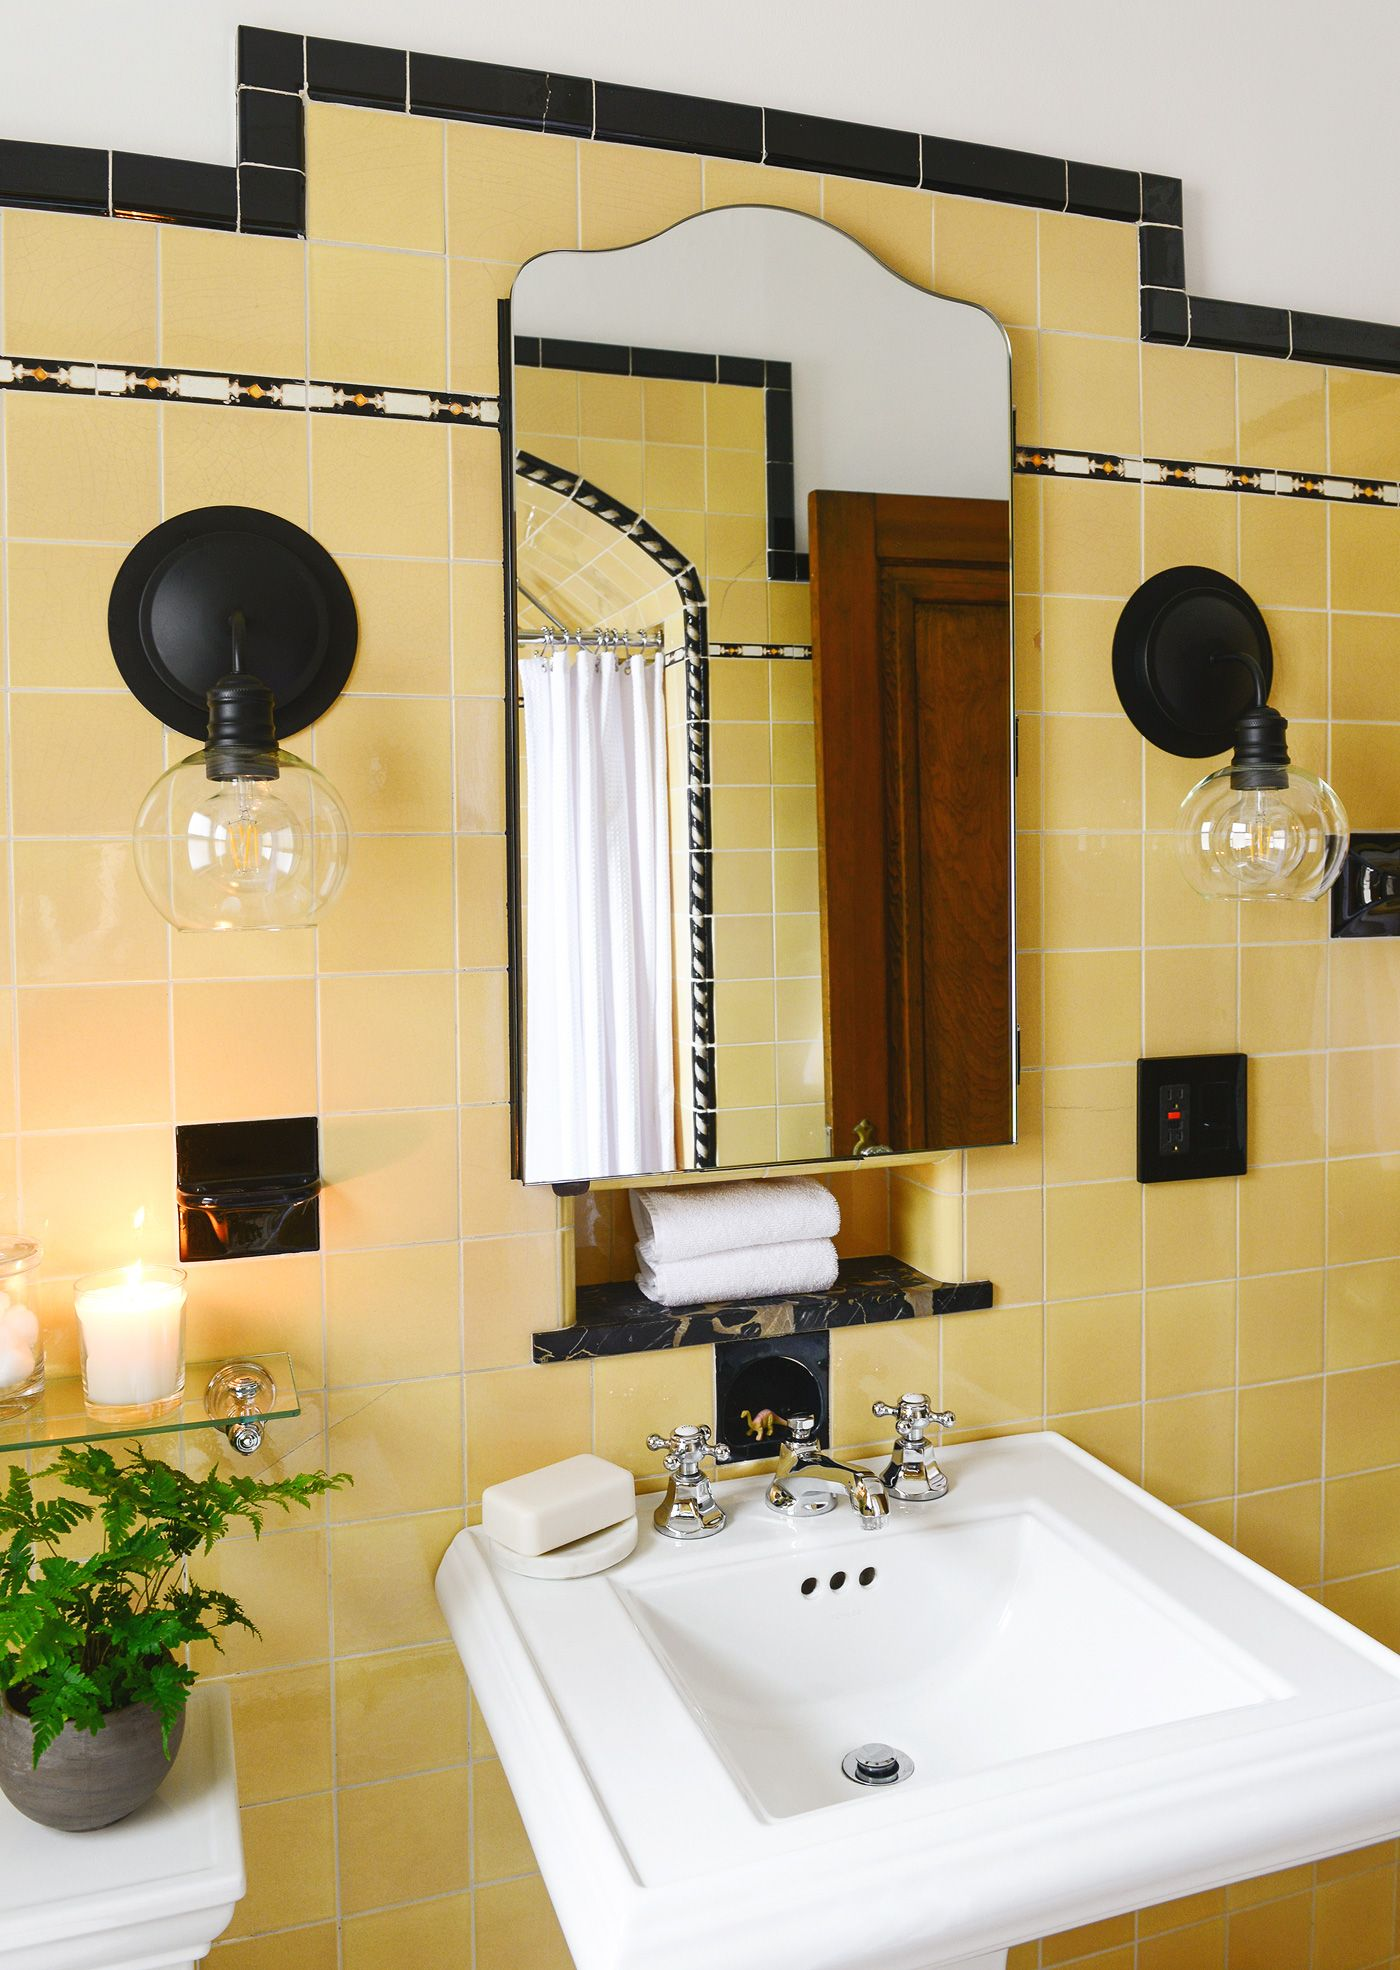 How To Refresh A Vintage Bathroom Keep The Charm Ii Of Ii Yellow Bathroom Tiles Vintage Bathroom Bathroom Makeover